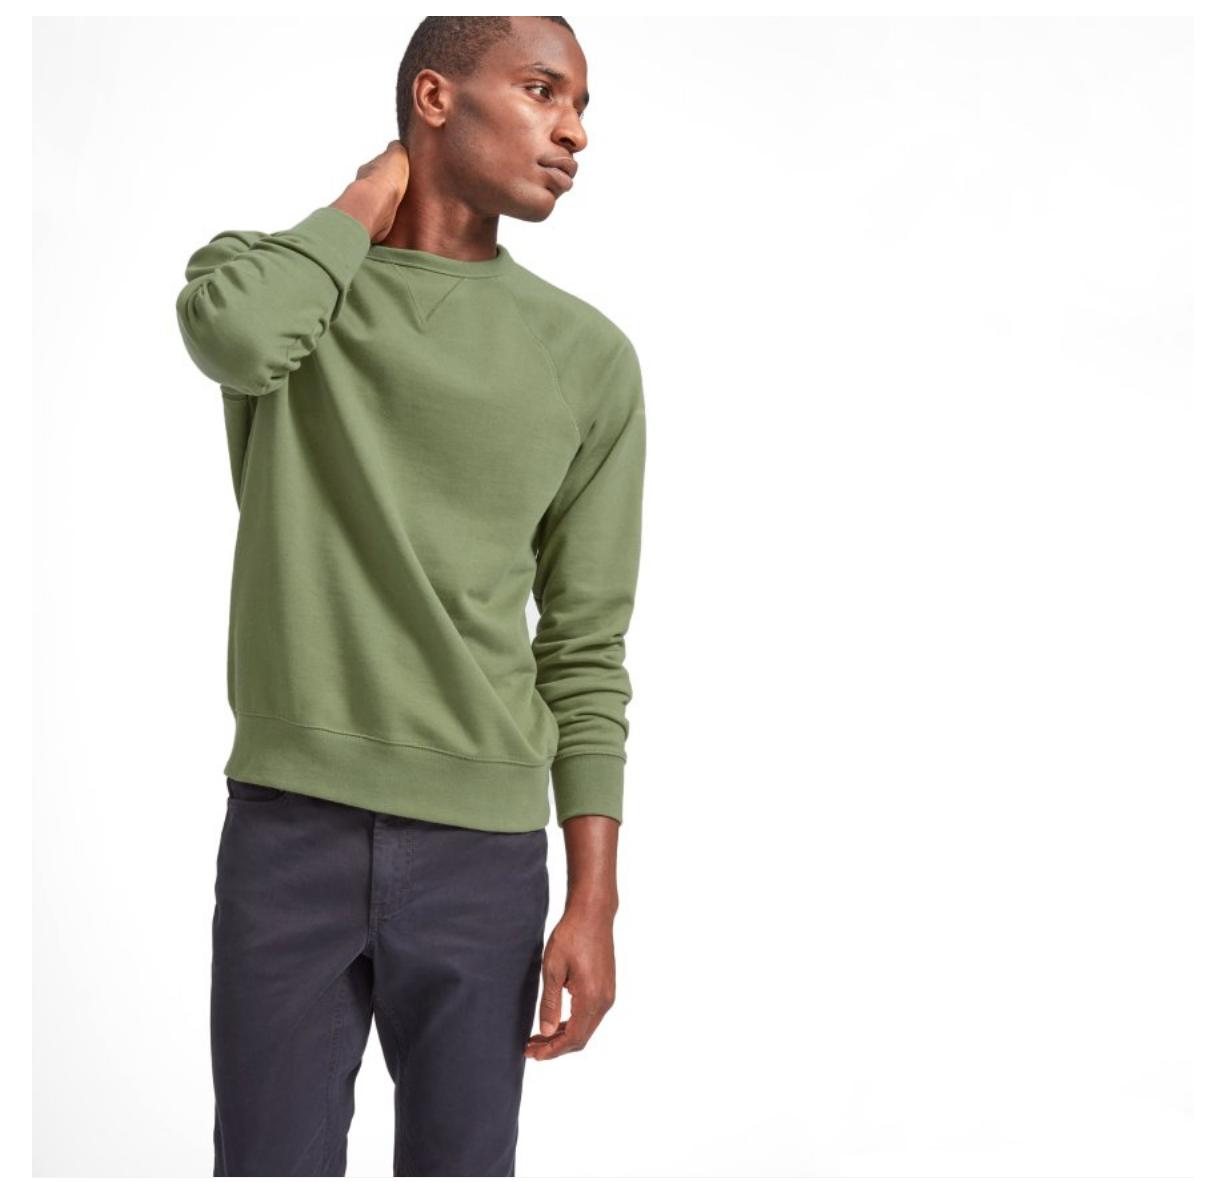 everlane Men, Mens sweatshirts, Mens tops